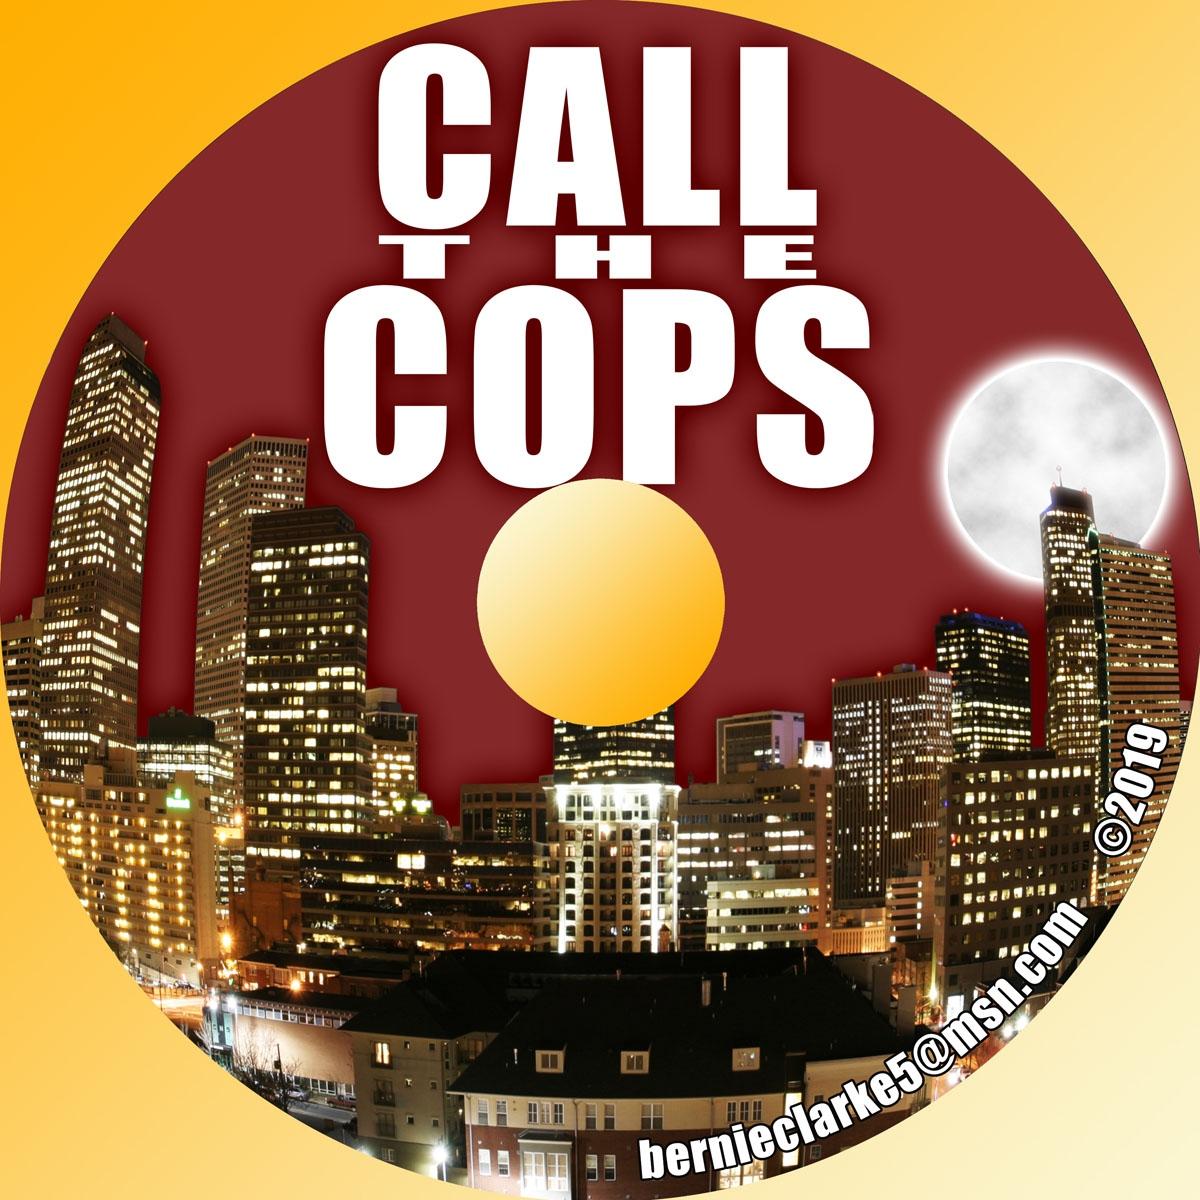 Call the Cops Disc